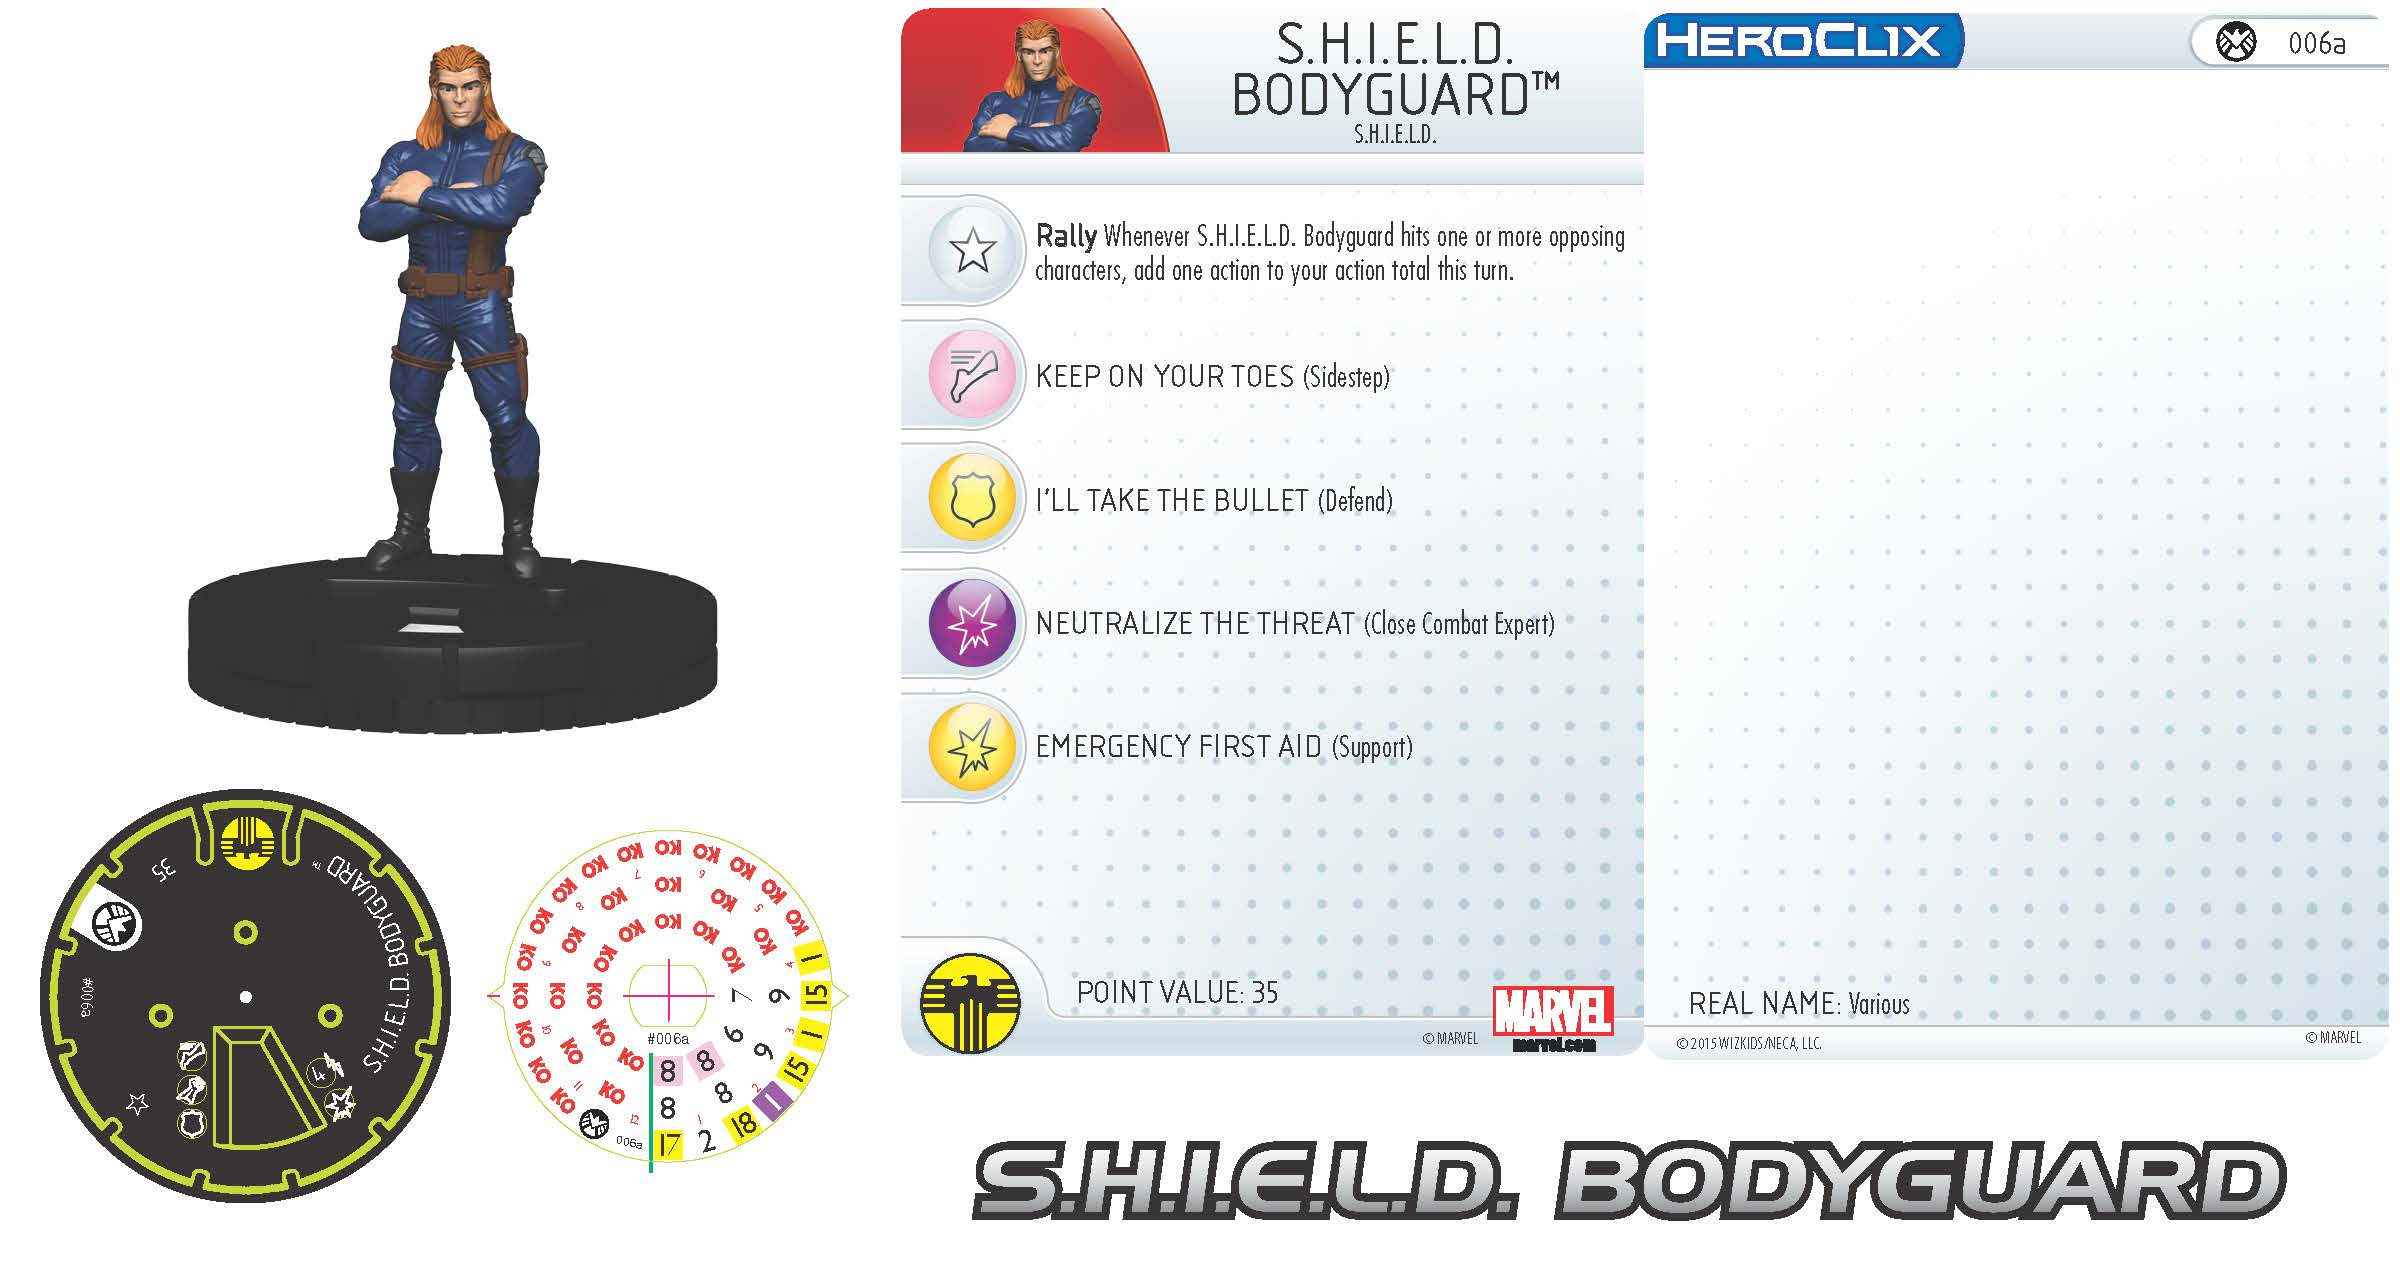 Marvel HeroClix: Nick Fury, Agent of S.H.I.E.L.D.- S.H.I.E.L.D. Bodyguard